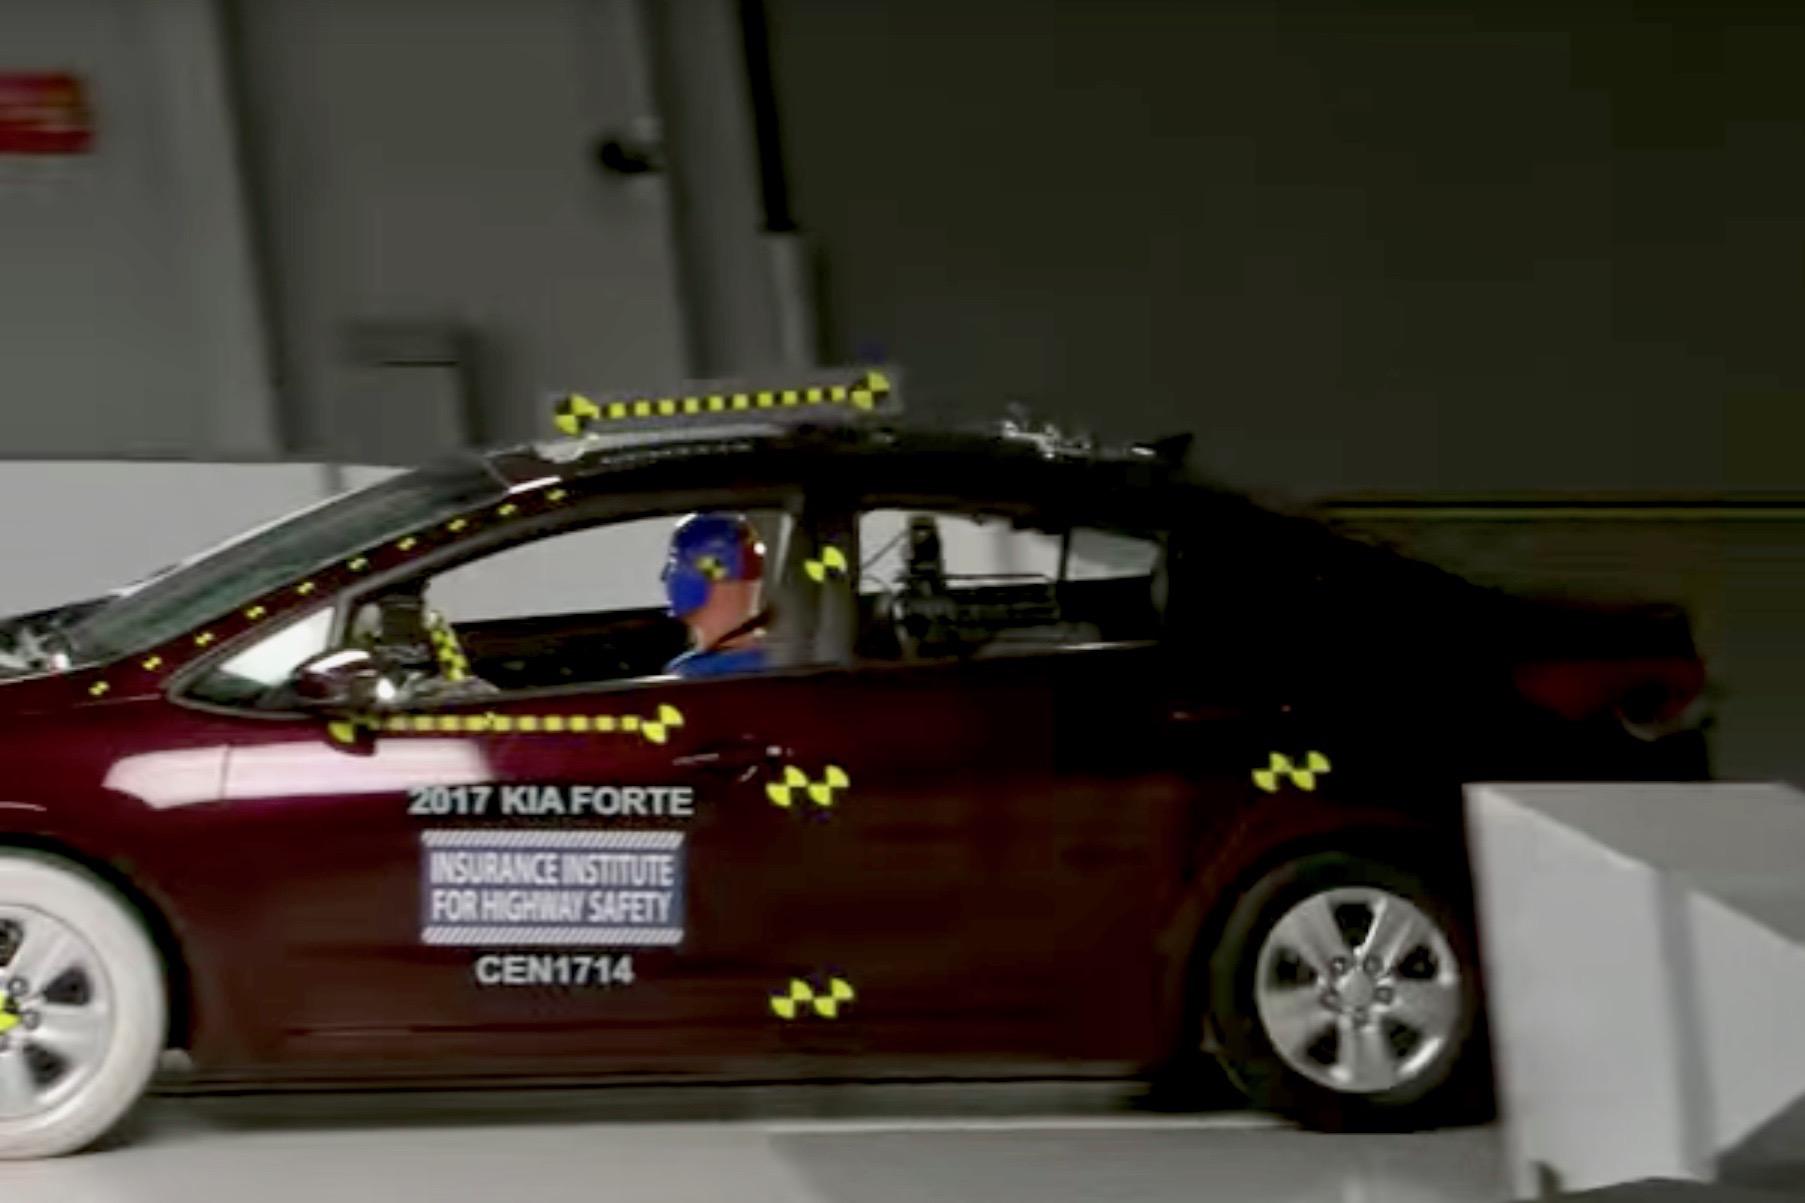 Kia Forte Shines in Crash Tests